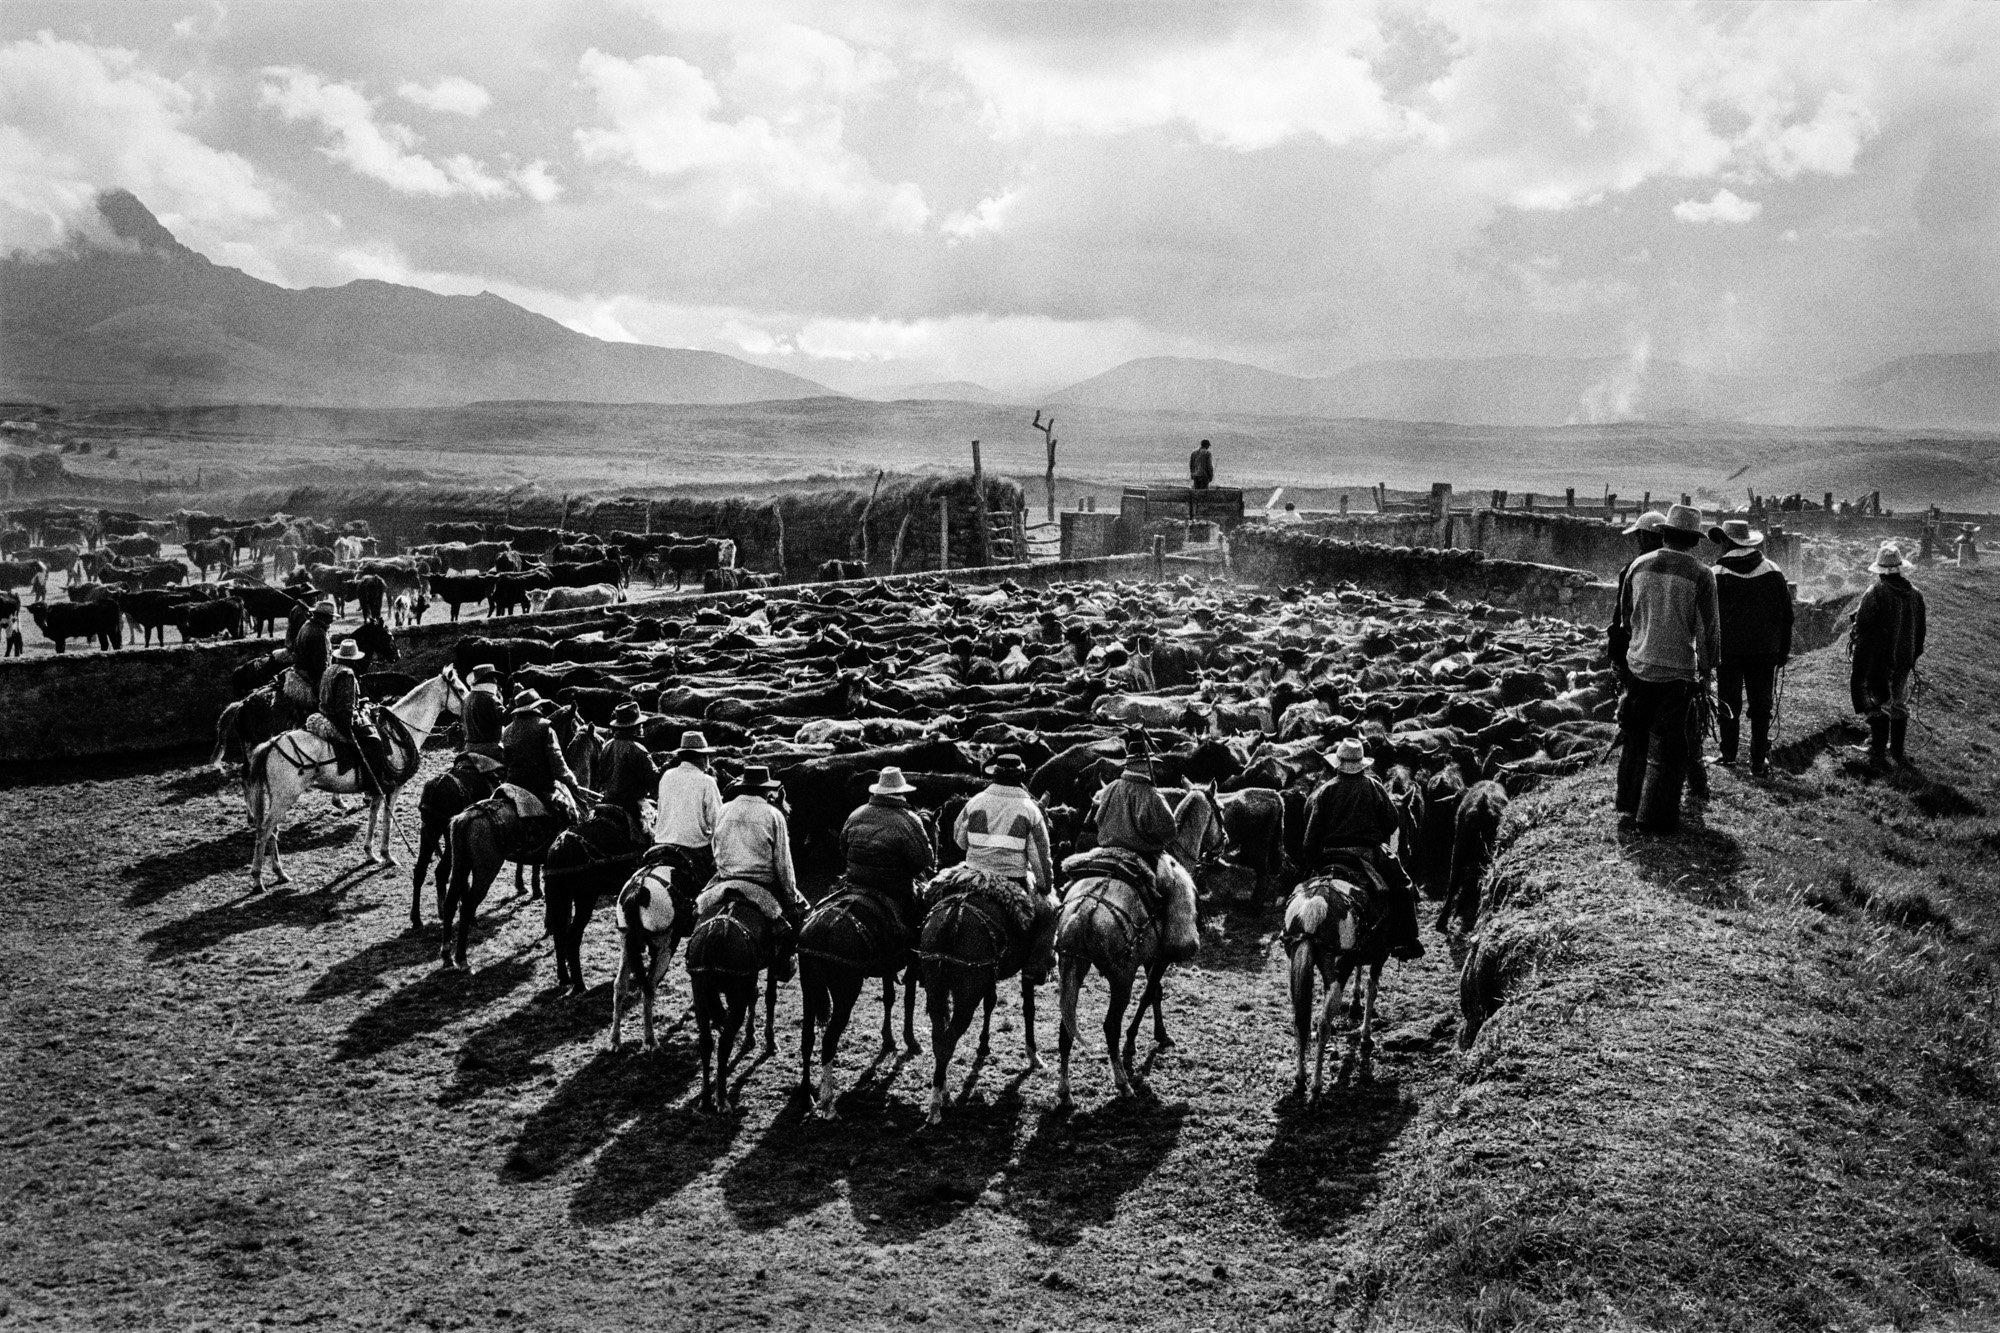 black and white photo of cowboys riding horses